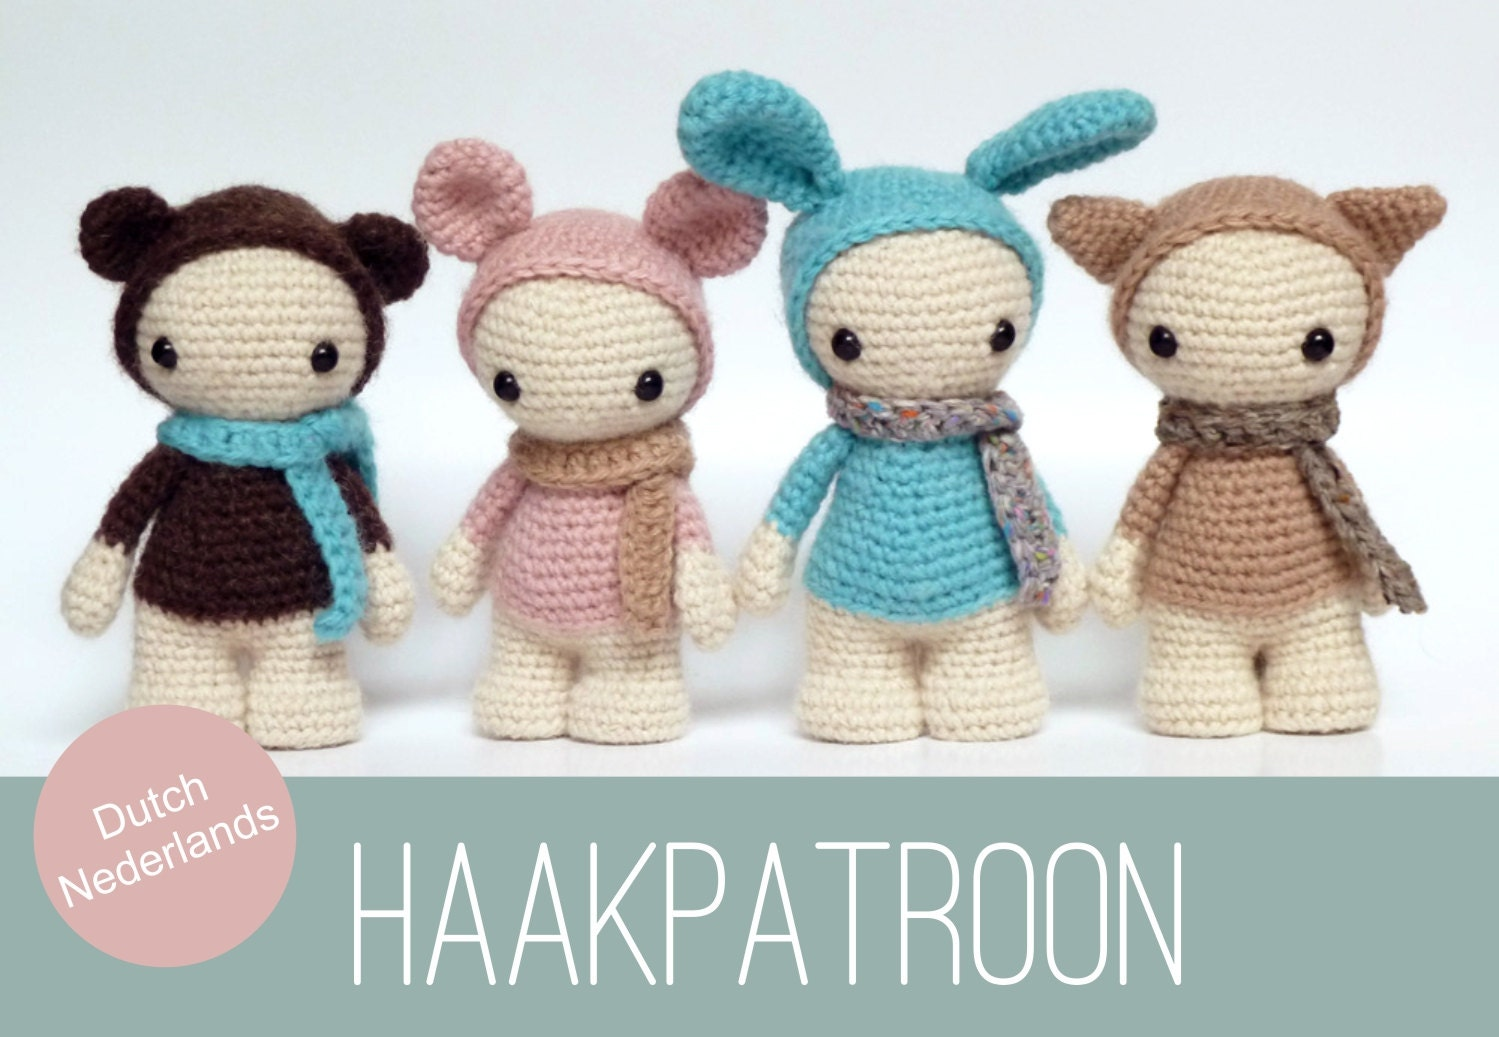 Amigurumi Leren Haken : Dutch nederlands amigurumi crochet pattern of four cute